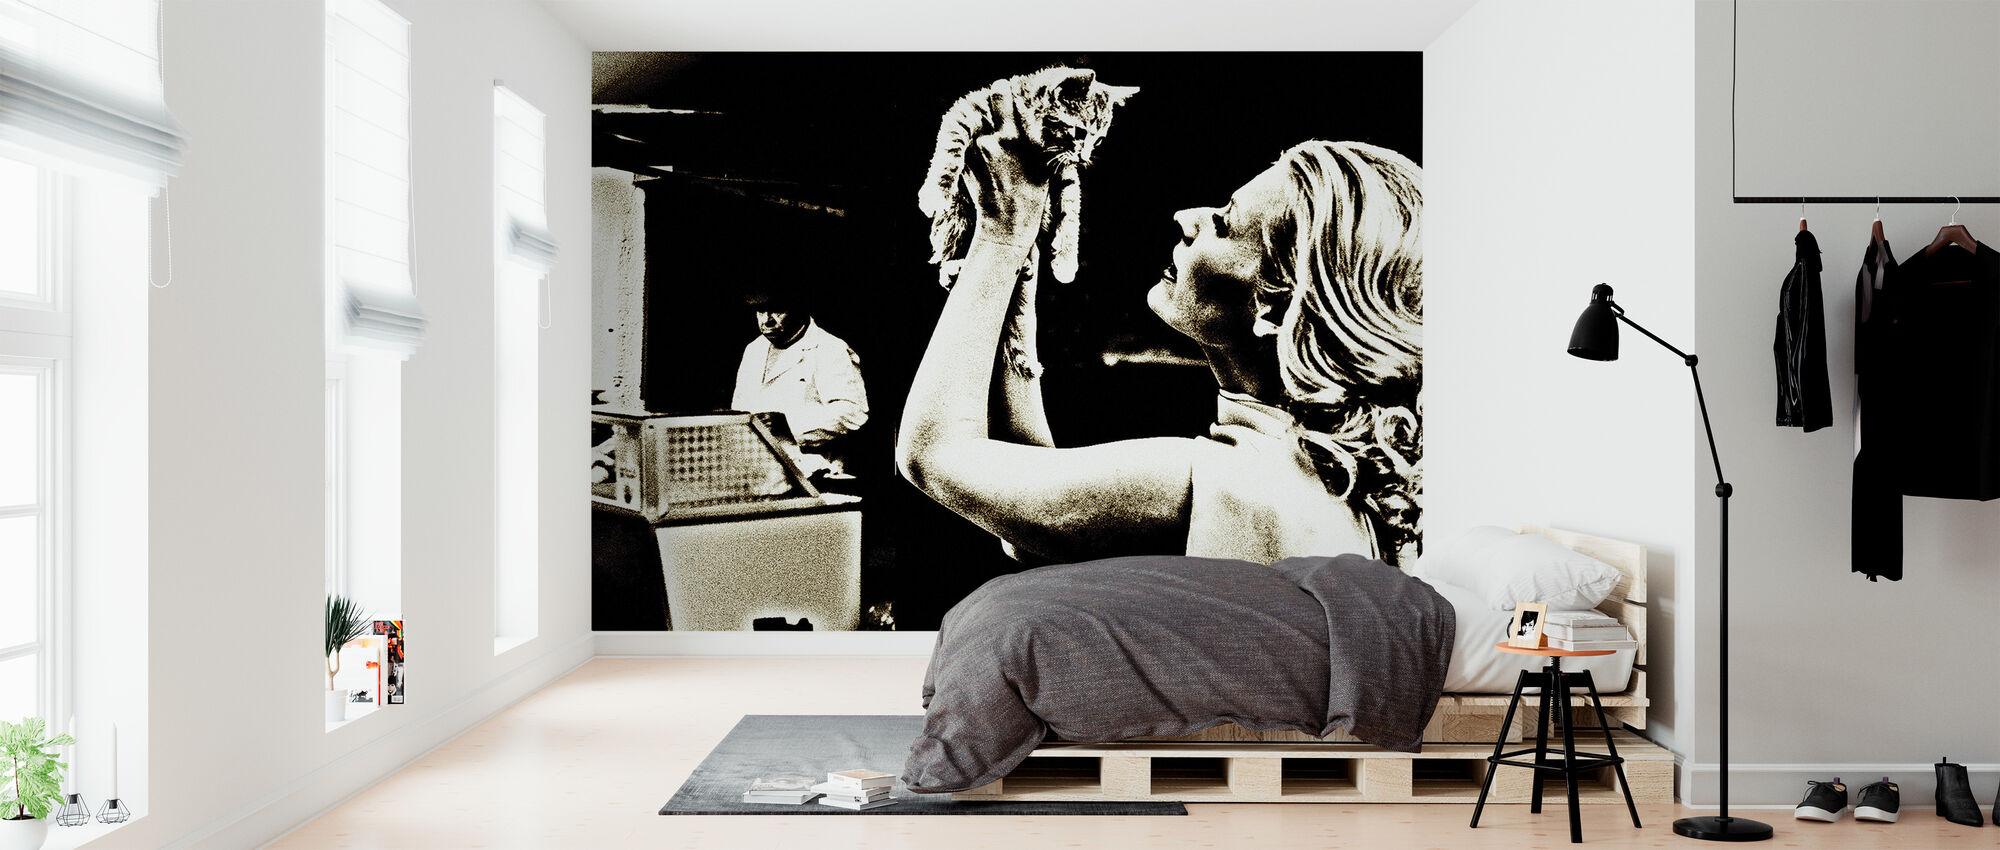 La Dolce Vita - Wallpaper - Bedroom